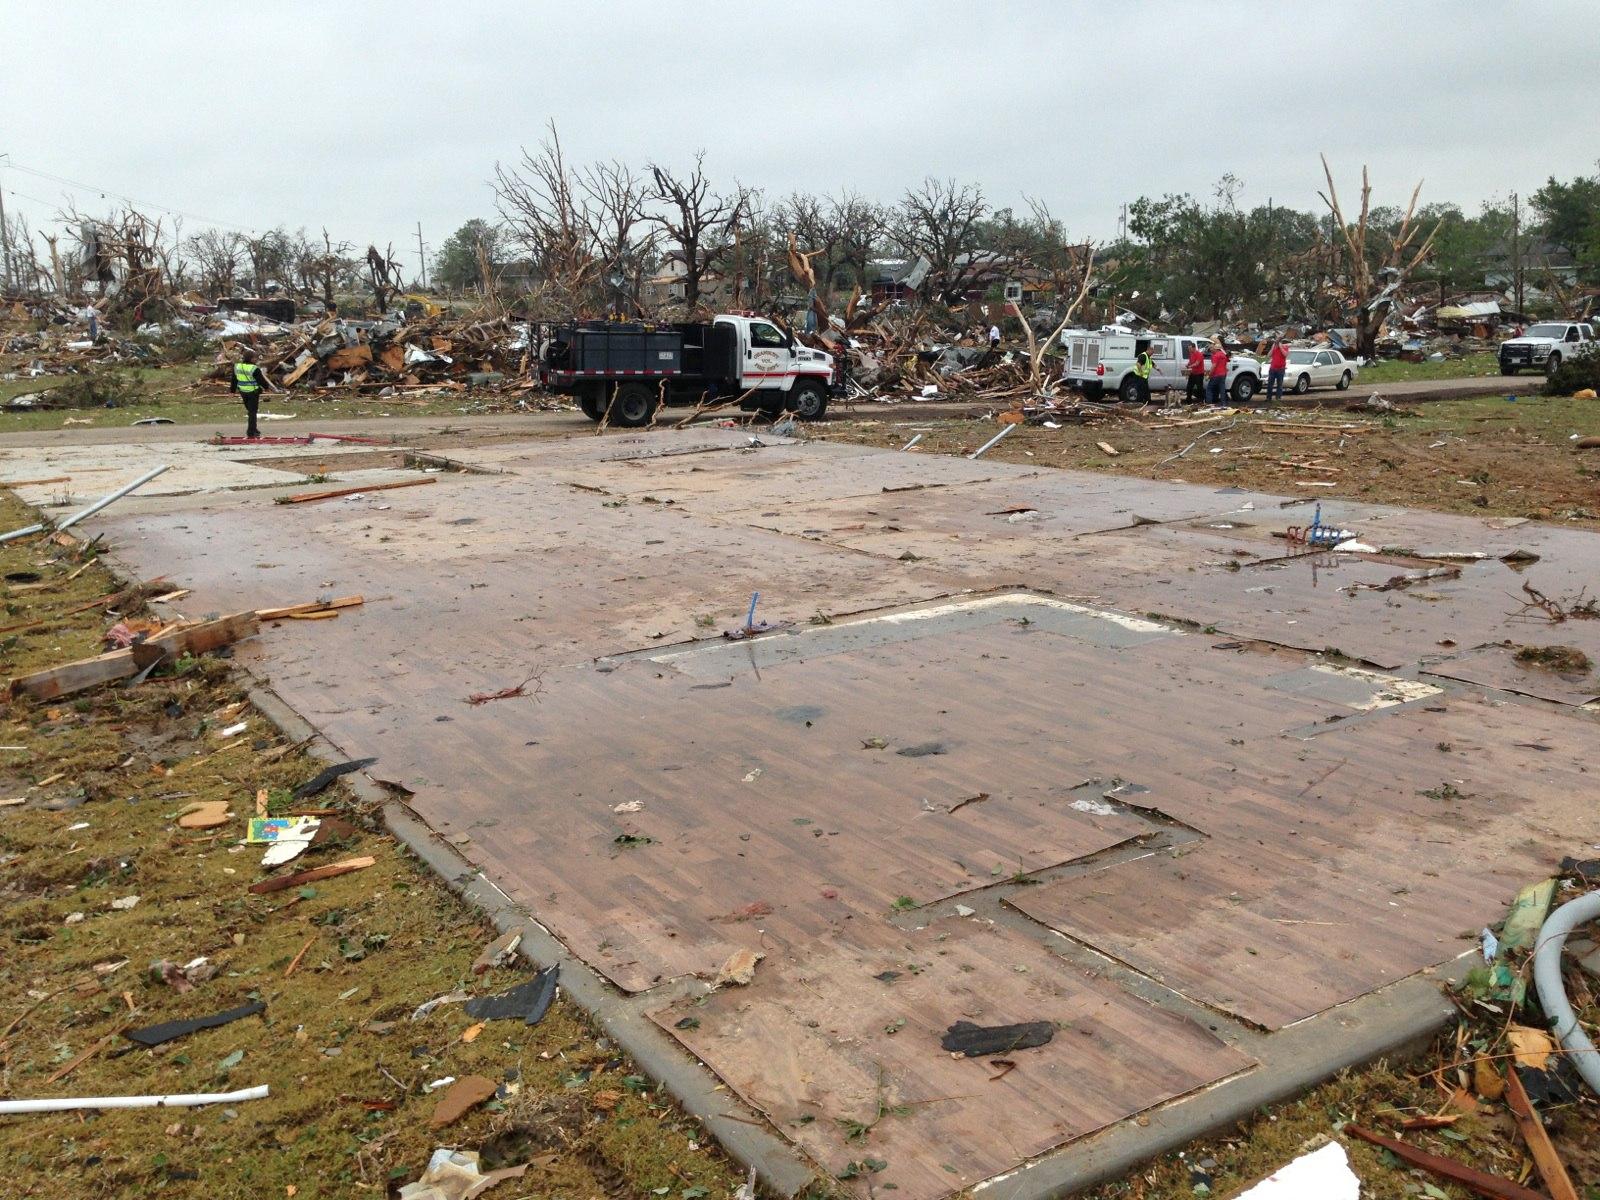 File:May 15, 2013 Granbury, Texas tornado damage jpg